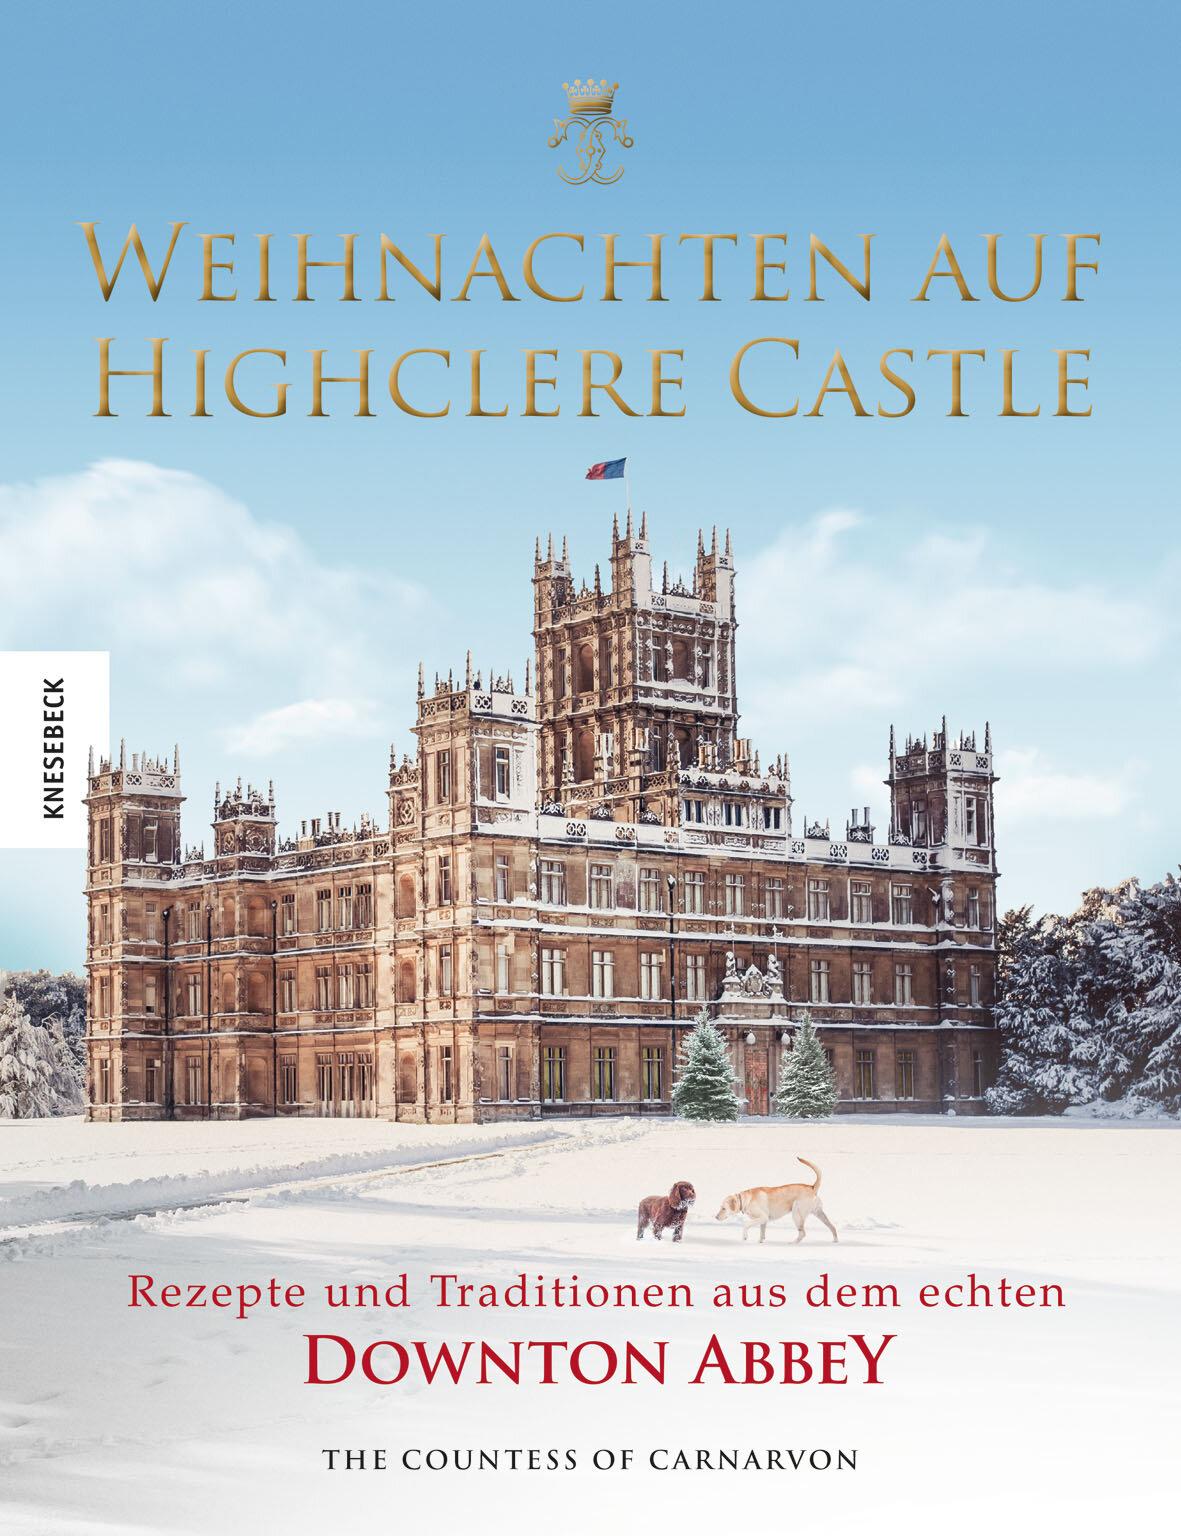 Weihnachten auf Highclere Castle, Fiona Countess of Carnarvon, Knesebeck, 35 Euro,  Amazon-Link *